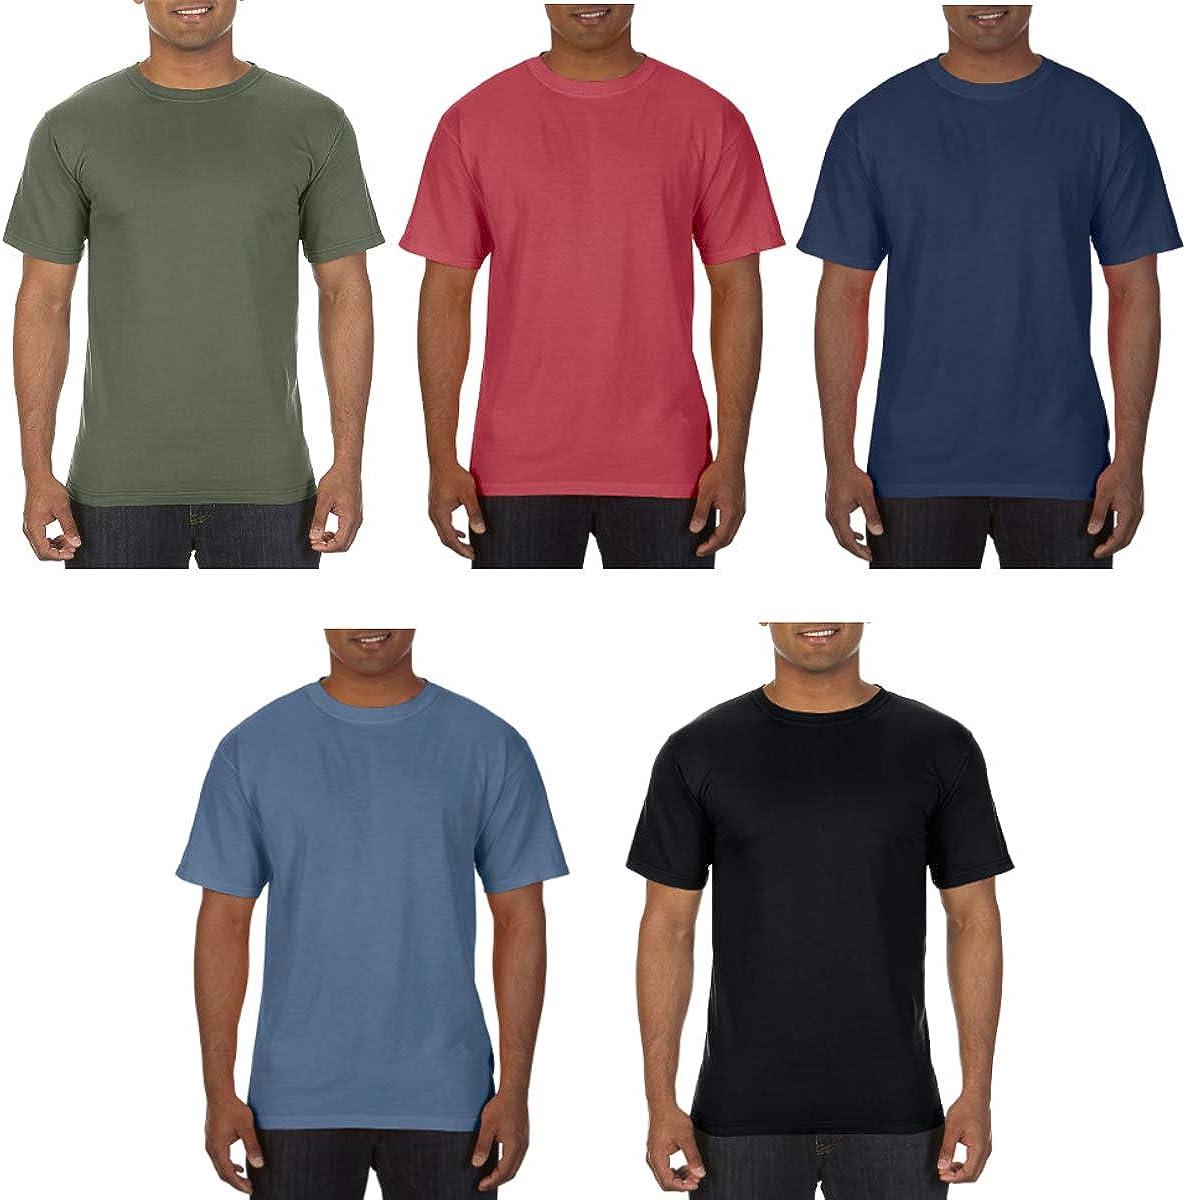 Comfort Colors (5 Pack) T Shirts for Men Garment Dyed T Shirts 100% Cotton Soft Gildan T Shirt Unisex Pack